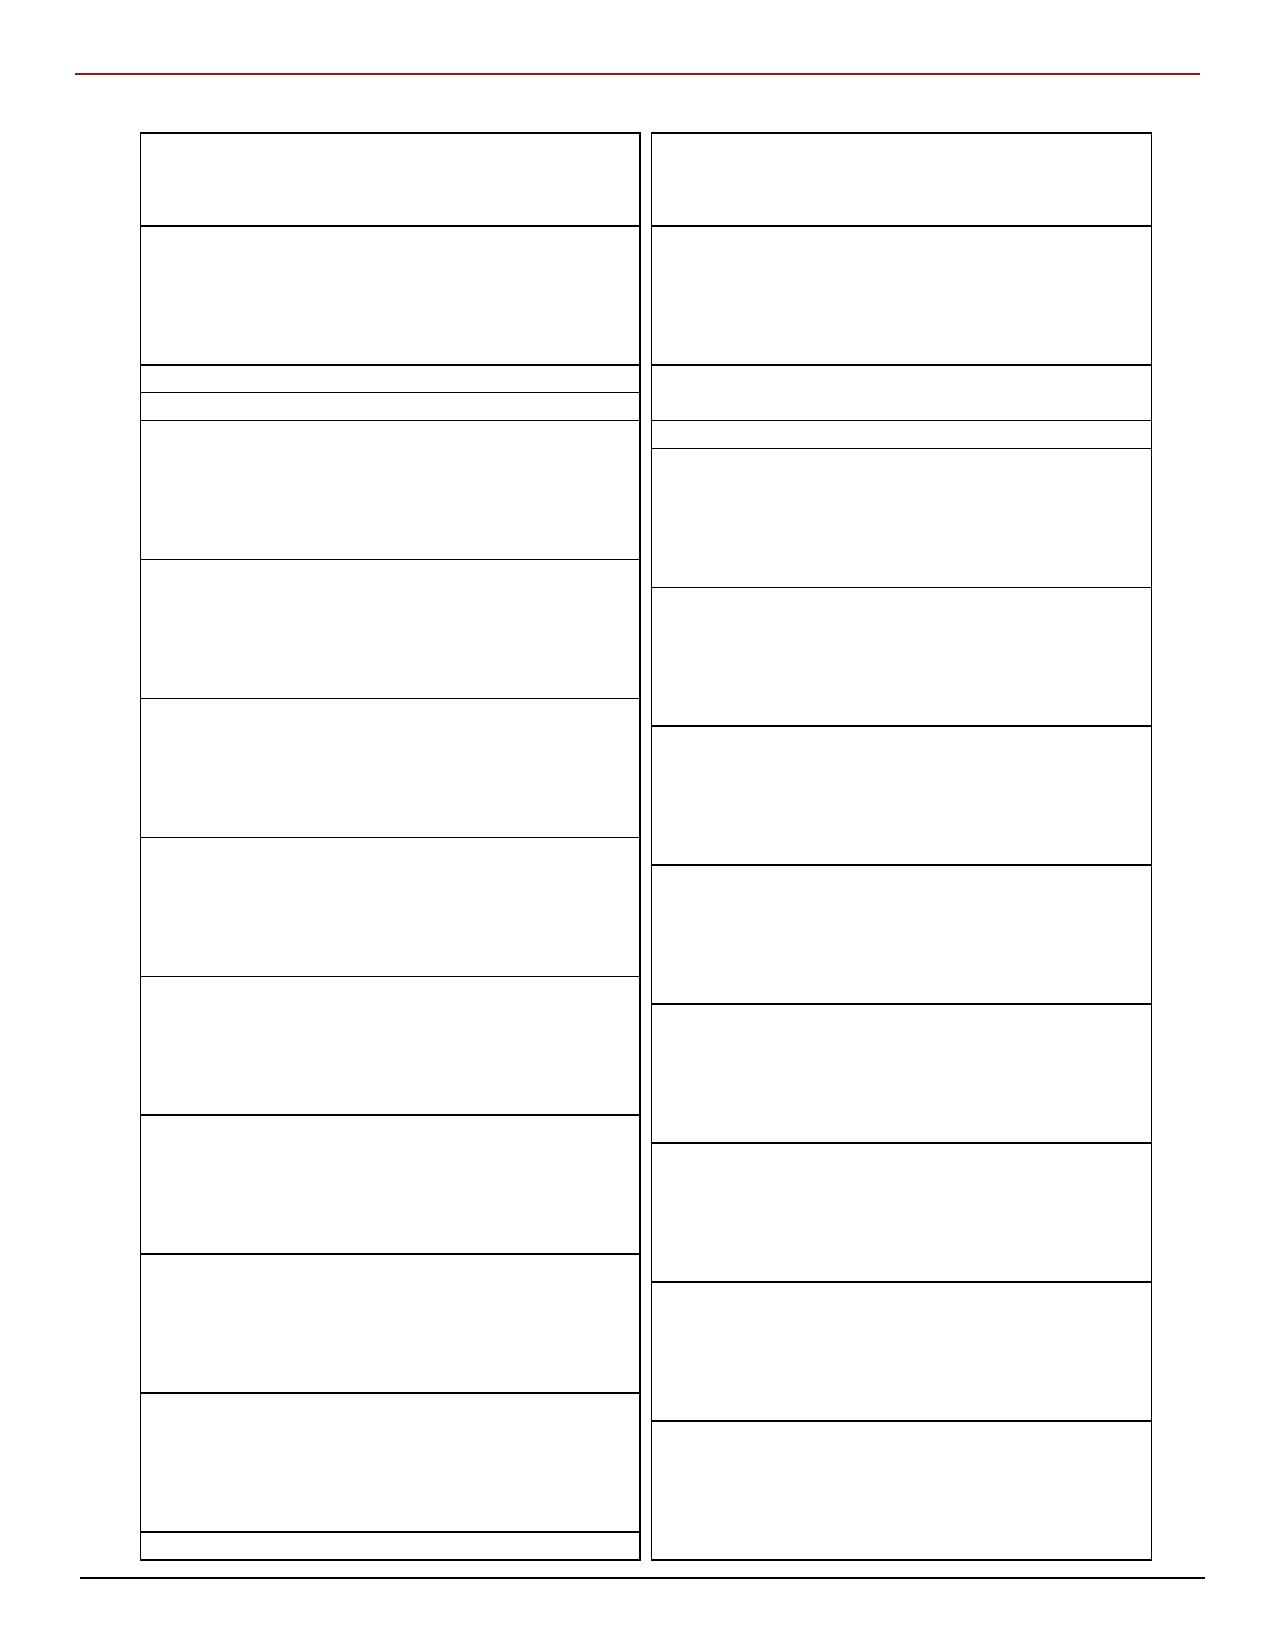 DCMC952T160BJ2B pdf, 数据表